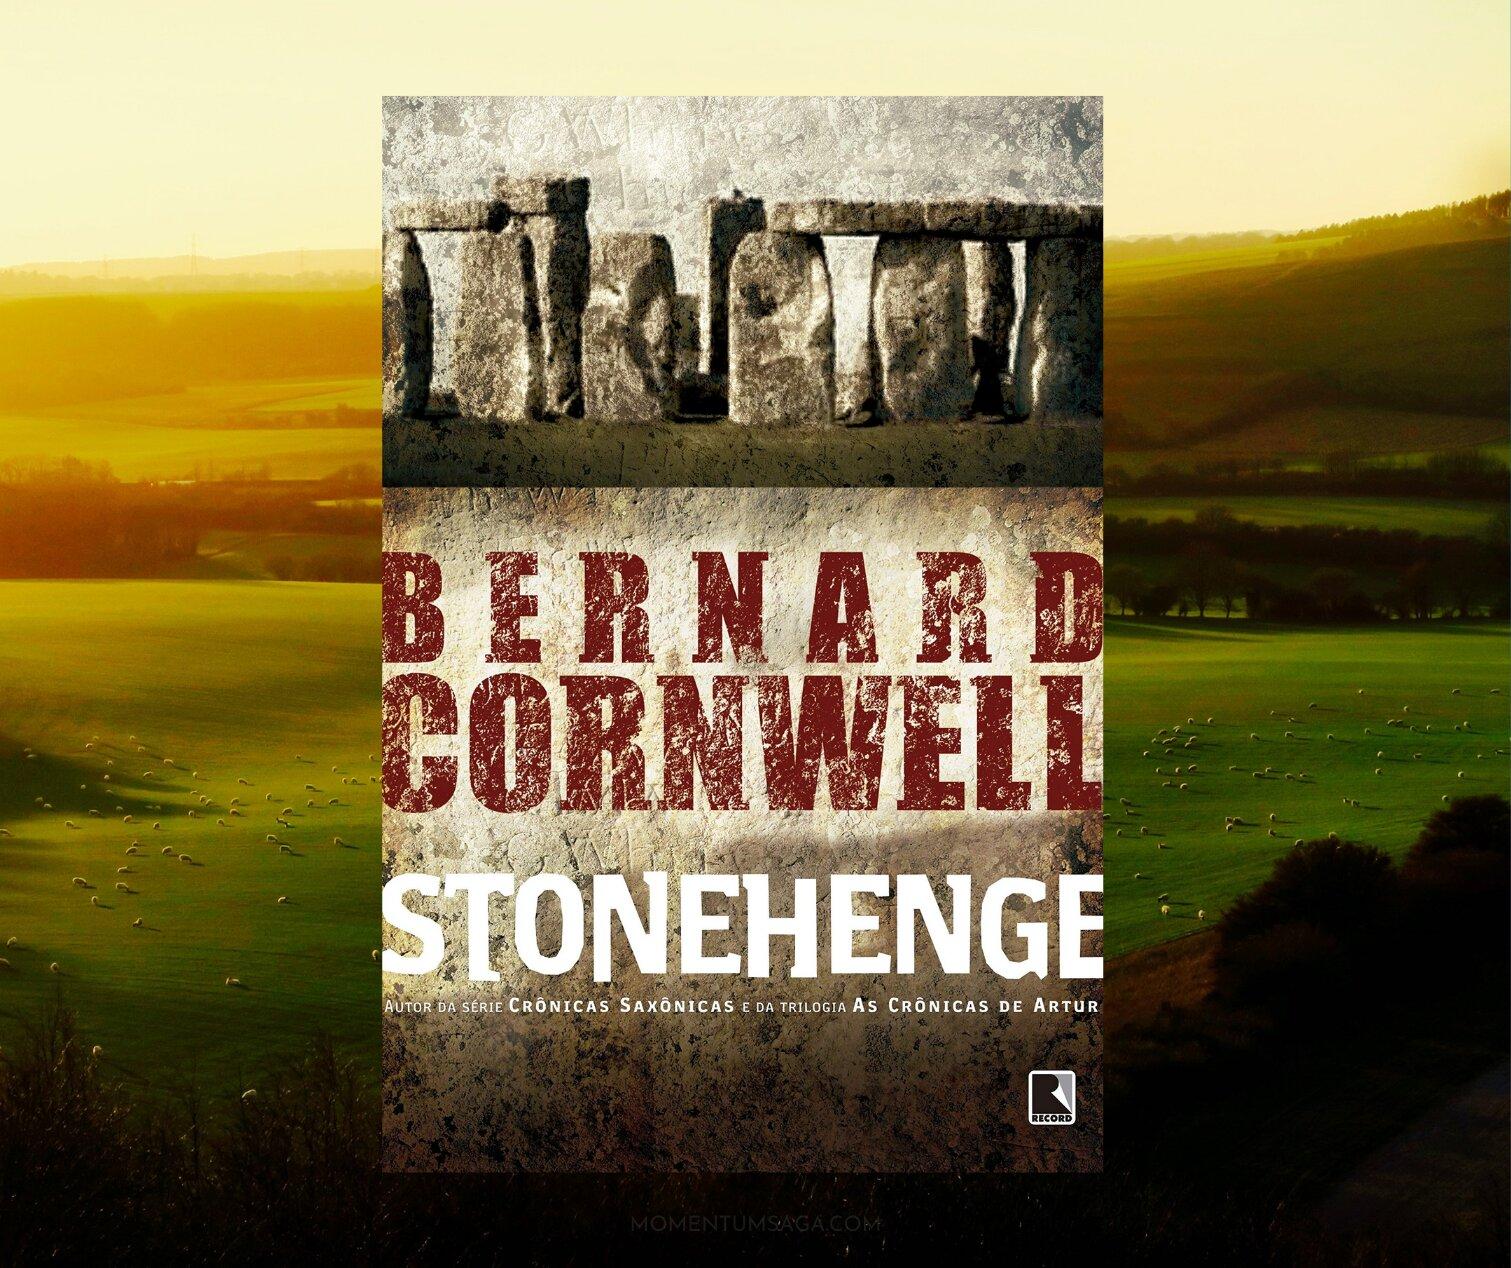 Resenha: Stonehenge, de Bernard Cornwell